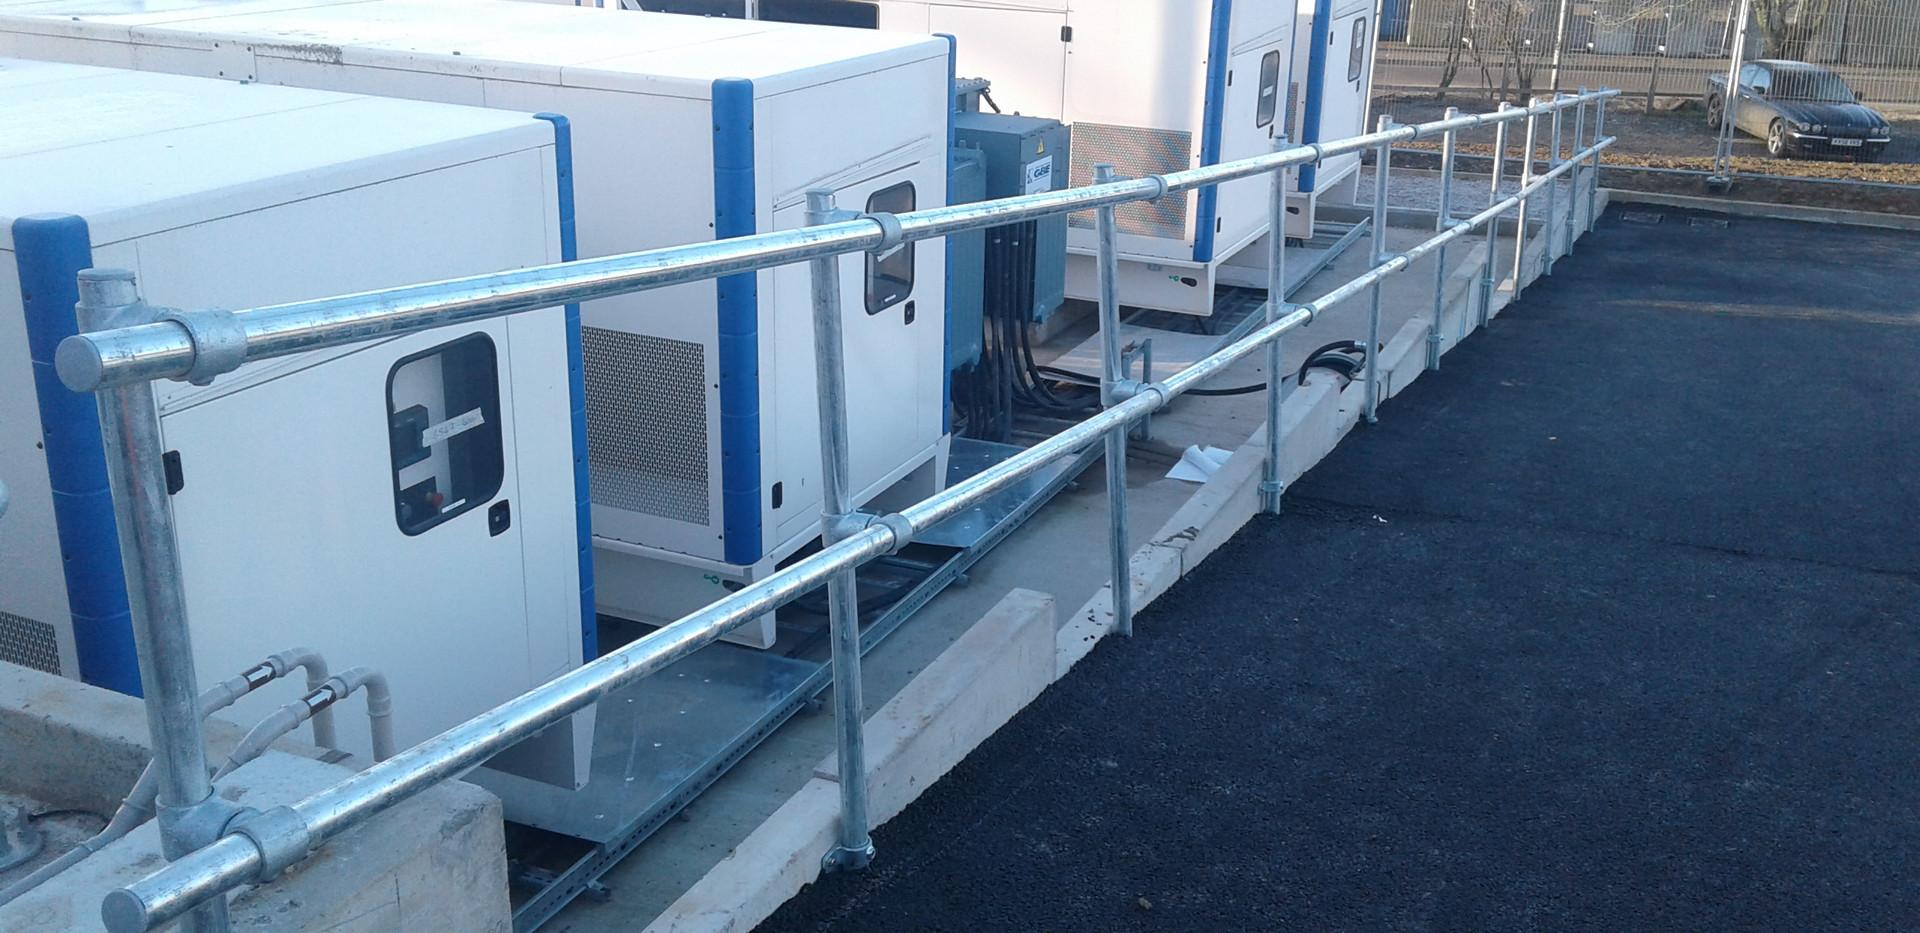 KITE Projects - Ipswich Docks - KITE Clamp Handrail